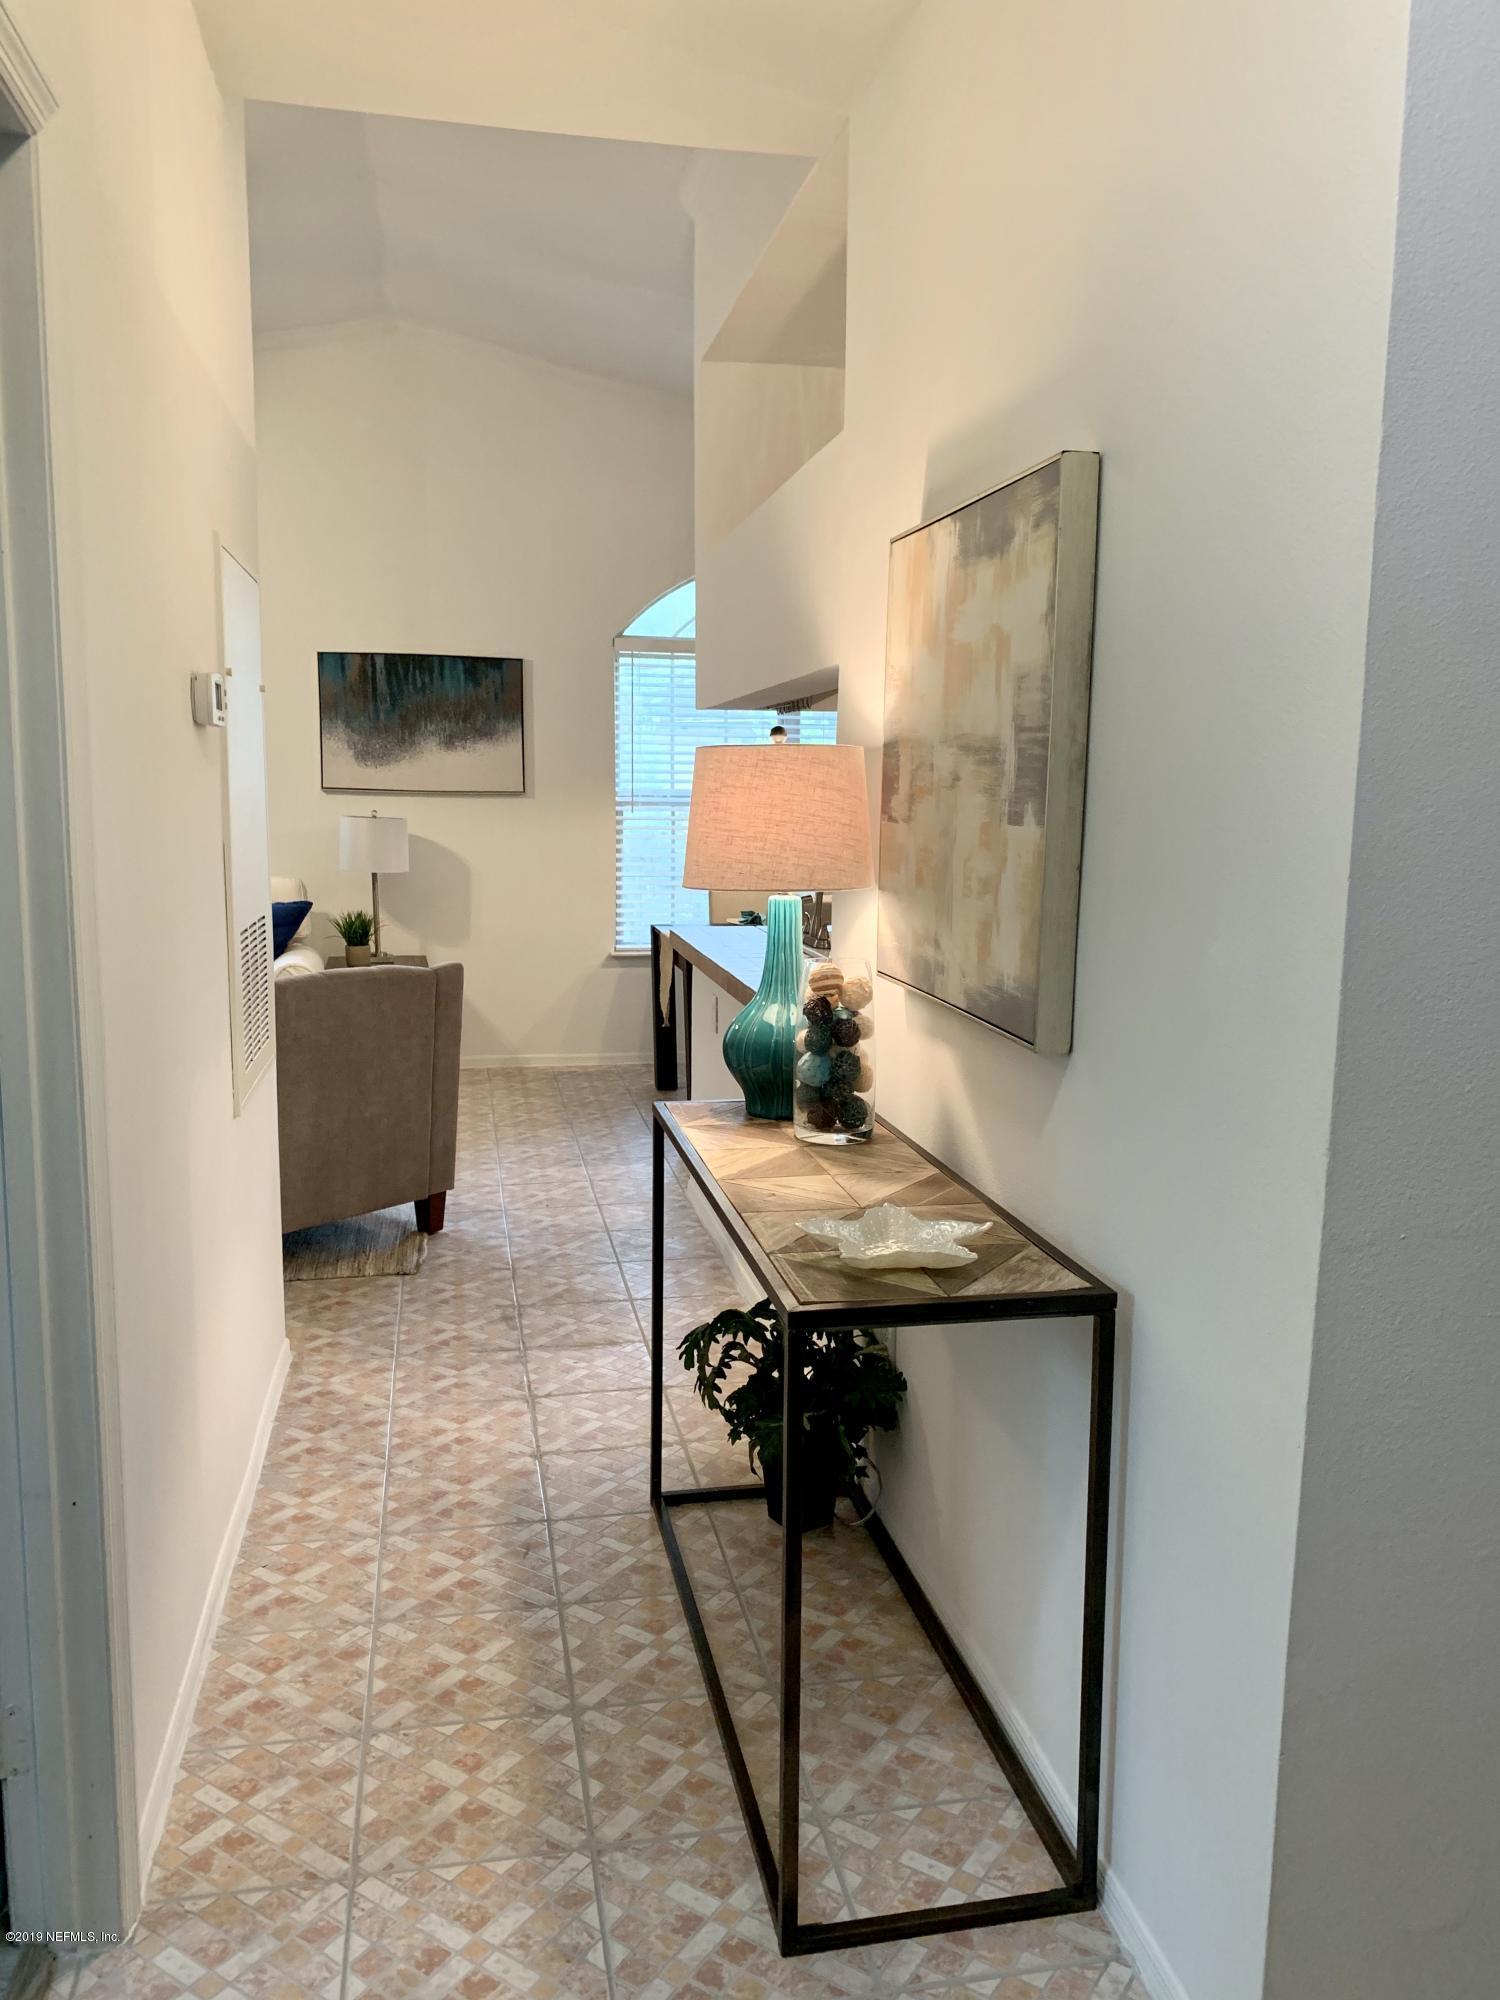 130 VERA CRUZ- PONTE VEDRA BEACH- FLORIDA 32082, 2 Bedrooms Bedrooms, ,1 BathroomBathrooms,Condo,For sale,VERA CRUZ,1022299